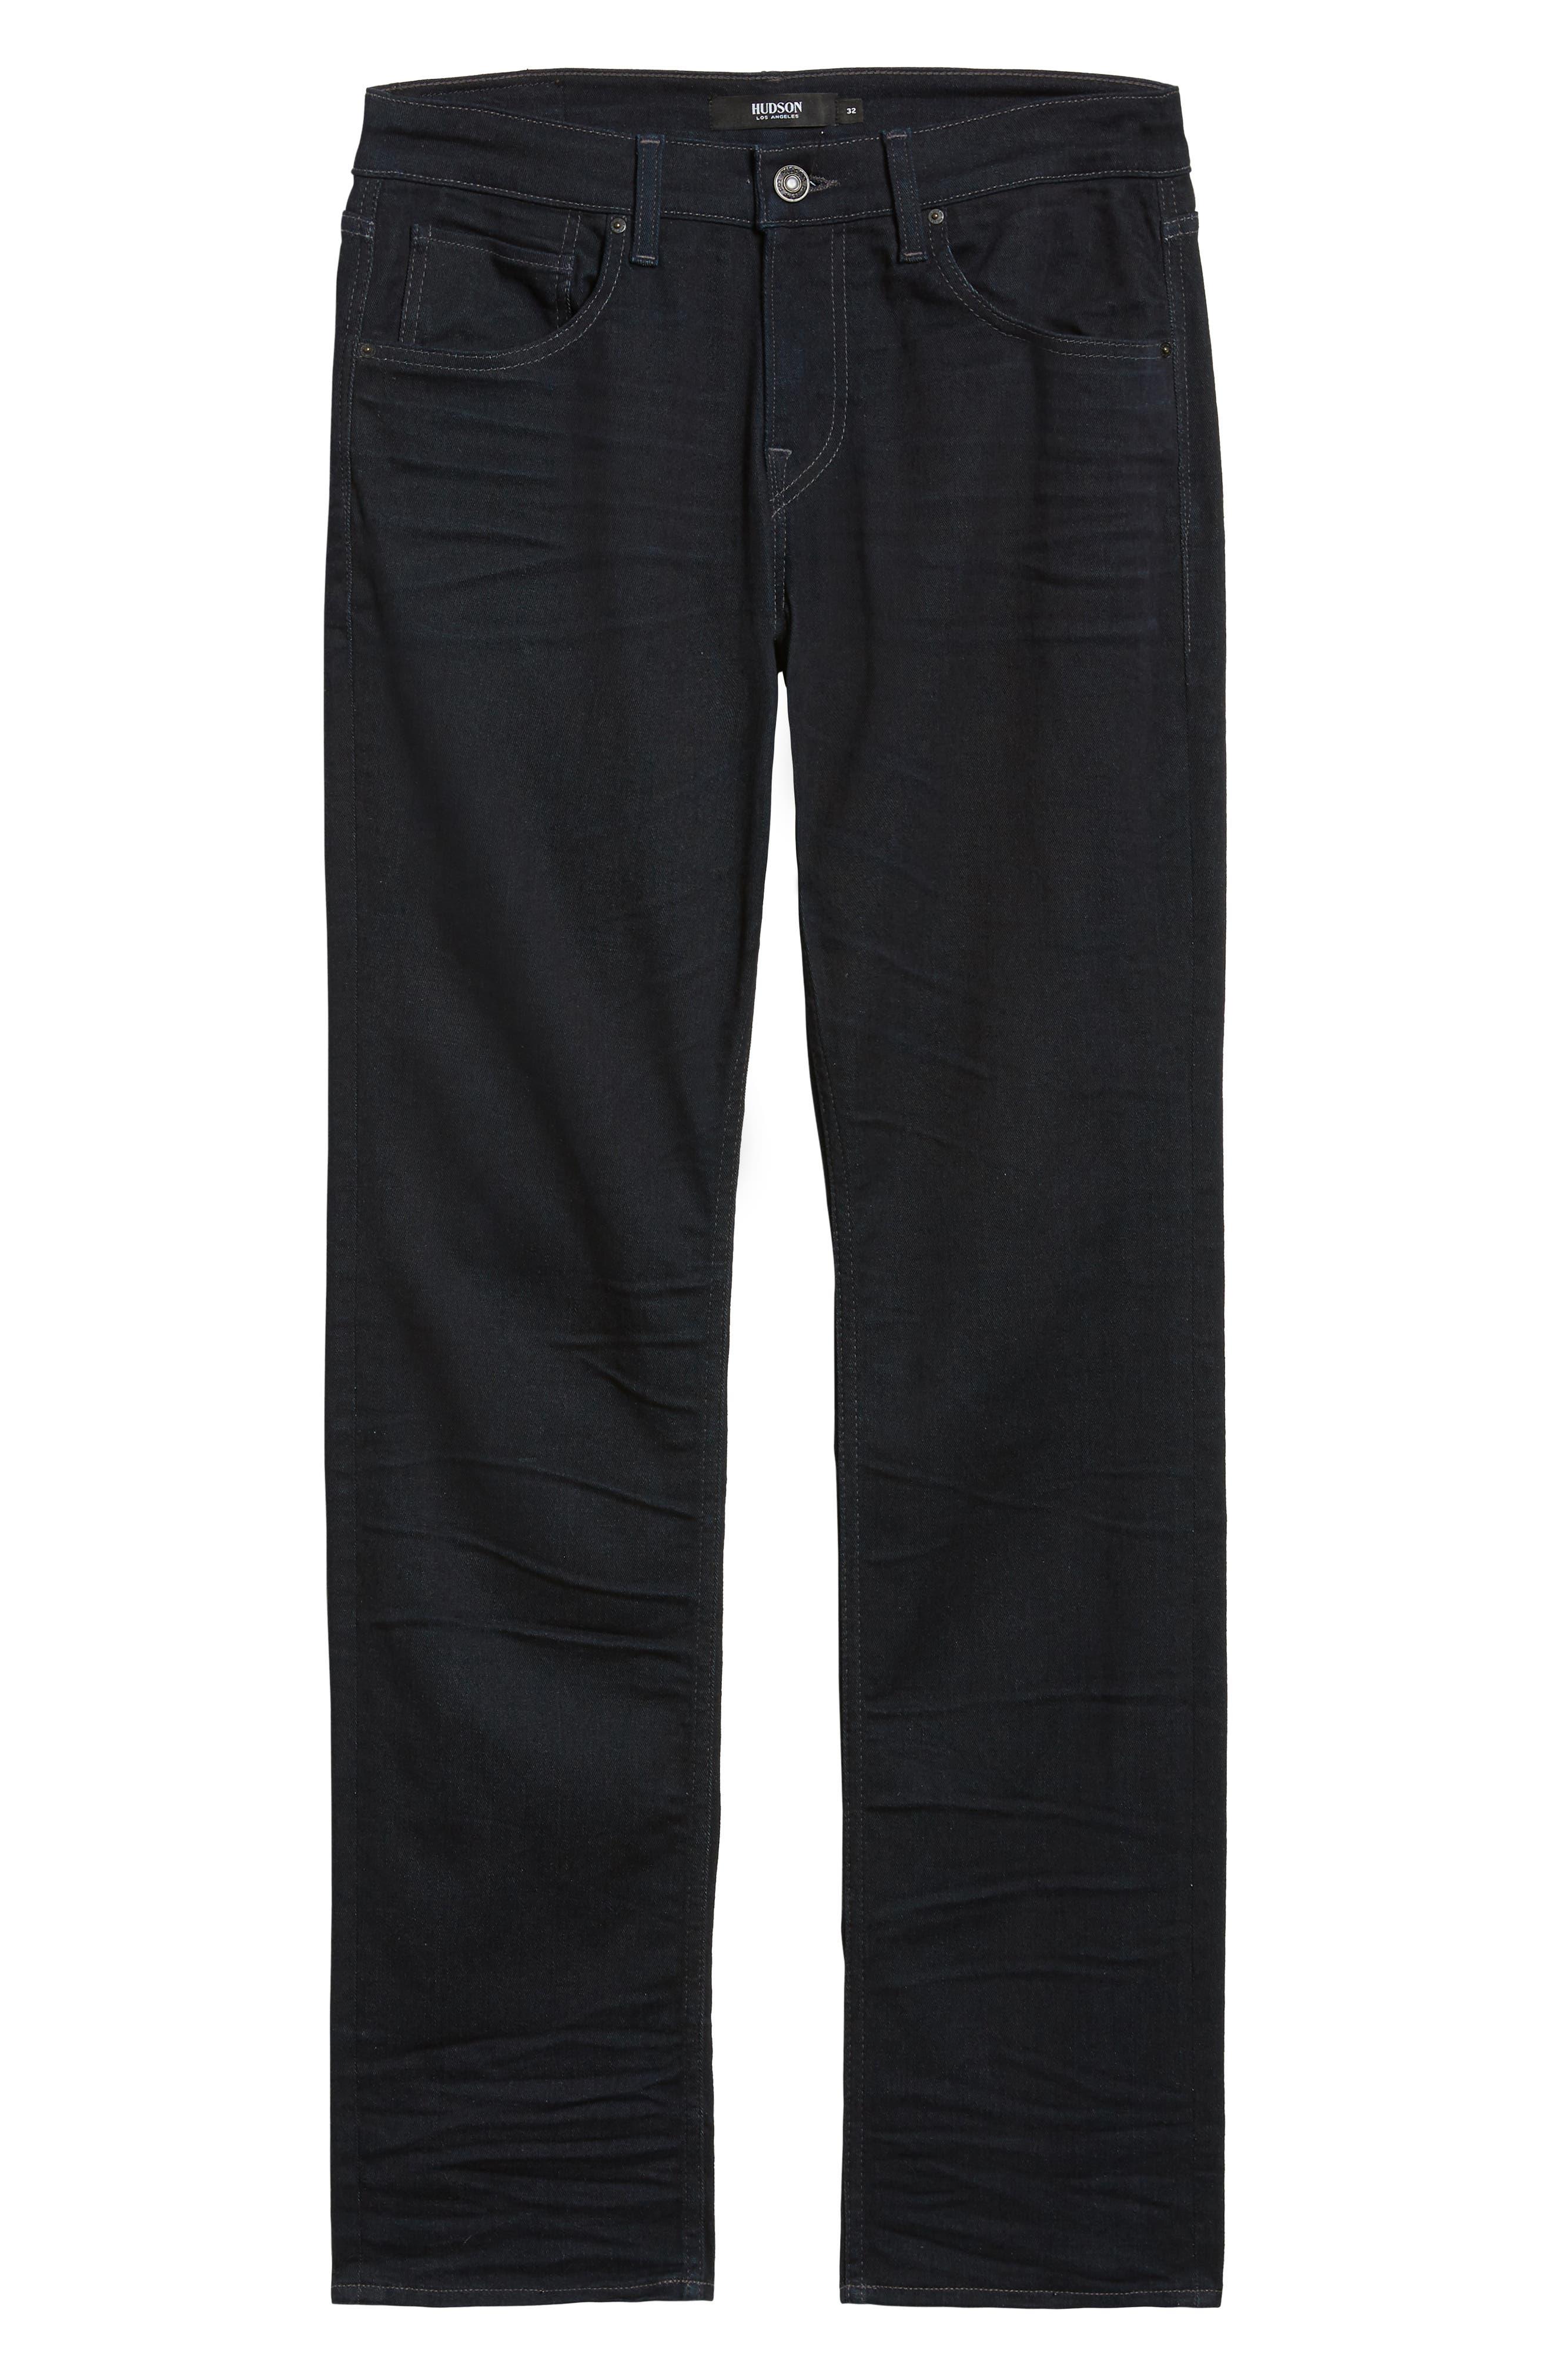 HUDSON JEANS, Byron Slim Straight Leg Jeans, Alternate thumbnail 6, color, TUDOR